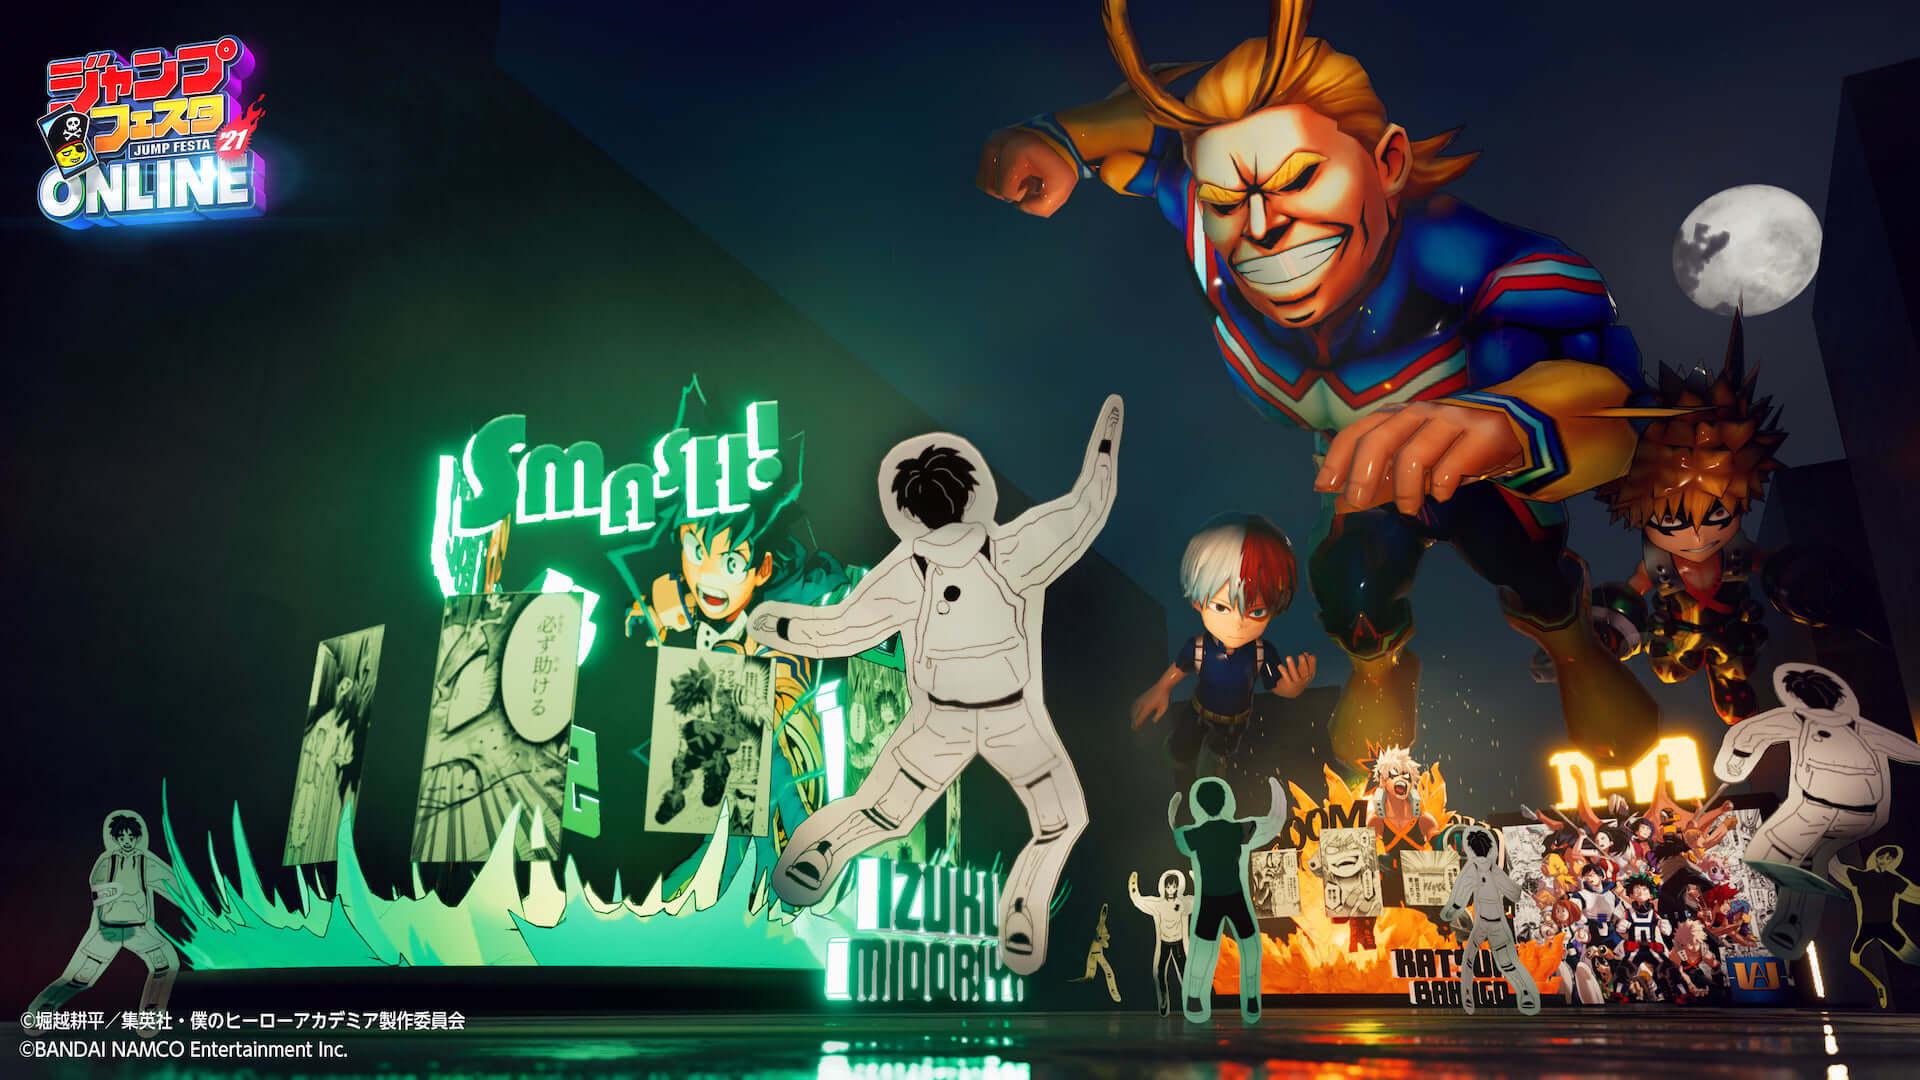 『ONE PIECE』と『僕のヒーローアカデミア』が<ジャンプフェスタ2021 ONLINE>のフィナーレを飾る!イベントの演出が一部公開|前夜祭はTikTokにて今夜配信 art201218_jumpfesta_2-1920x1080